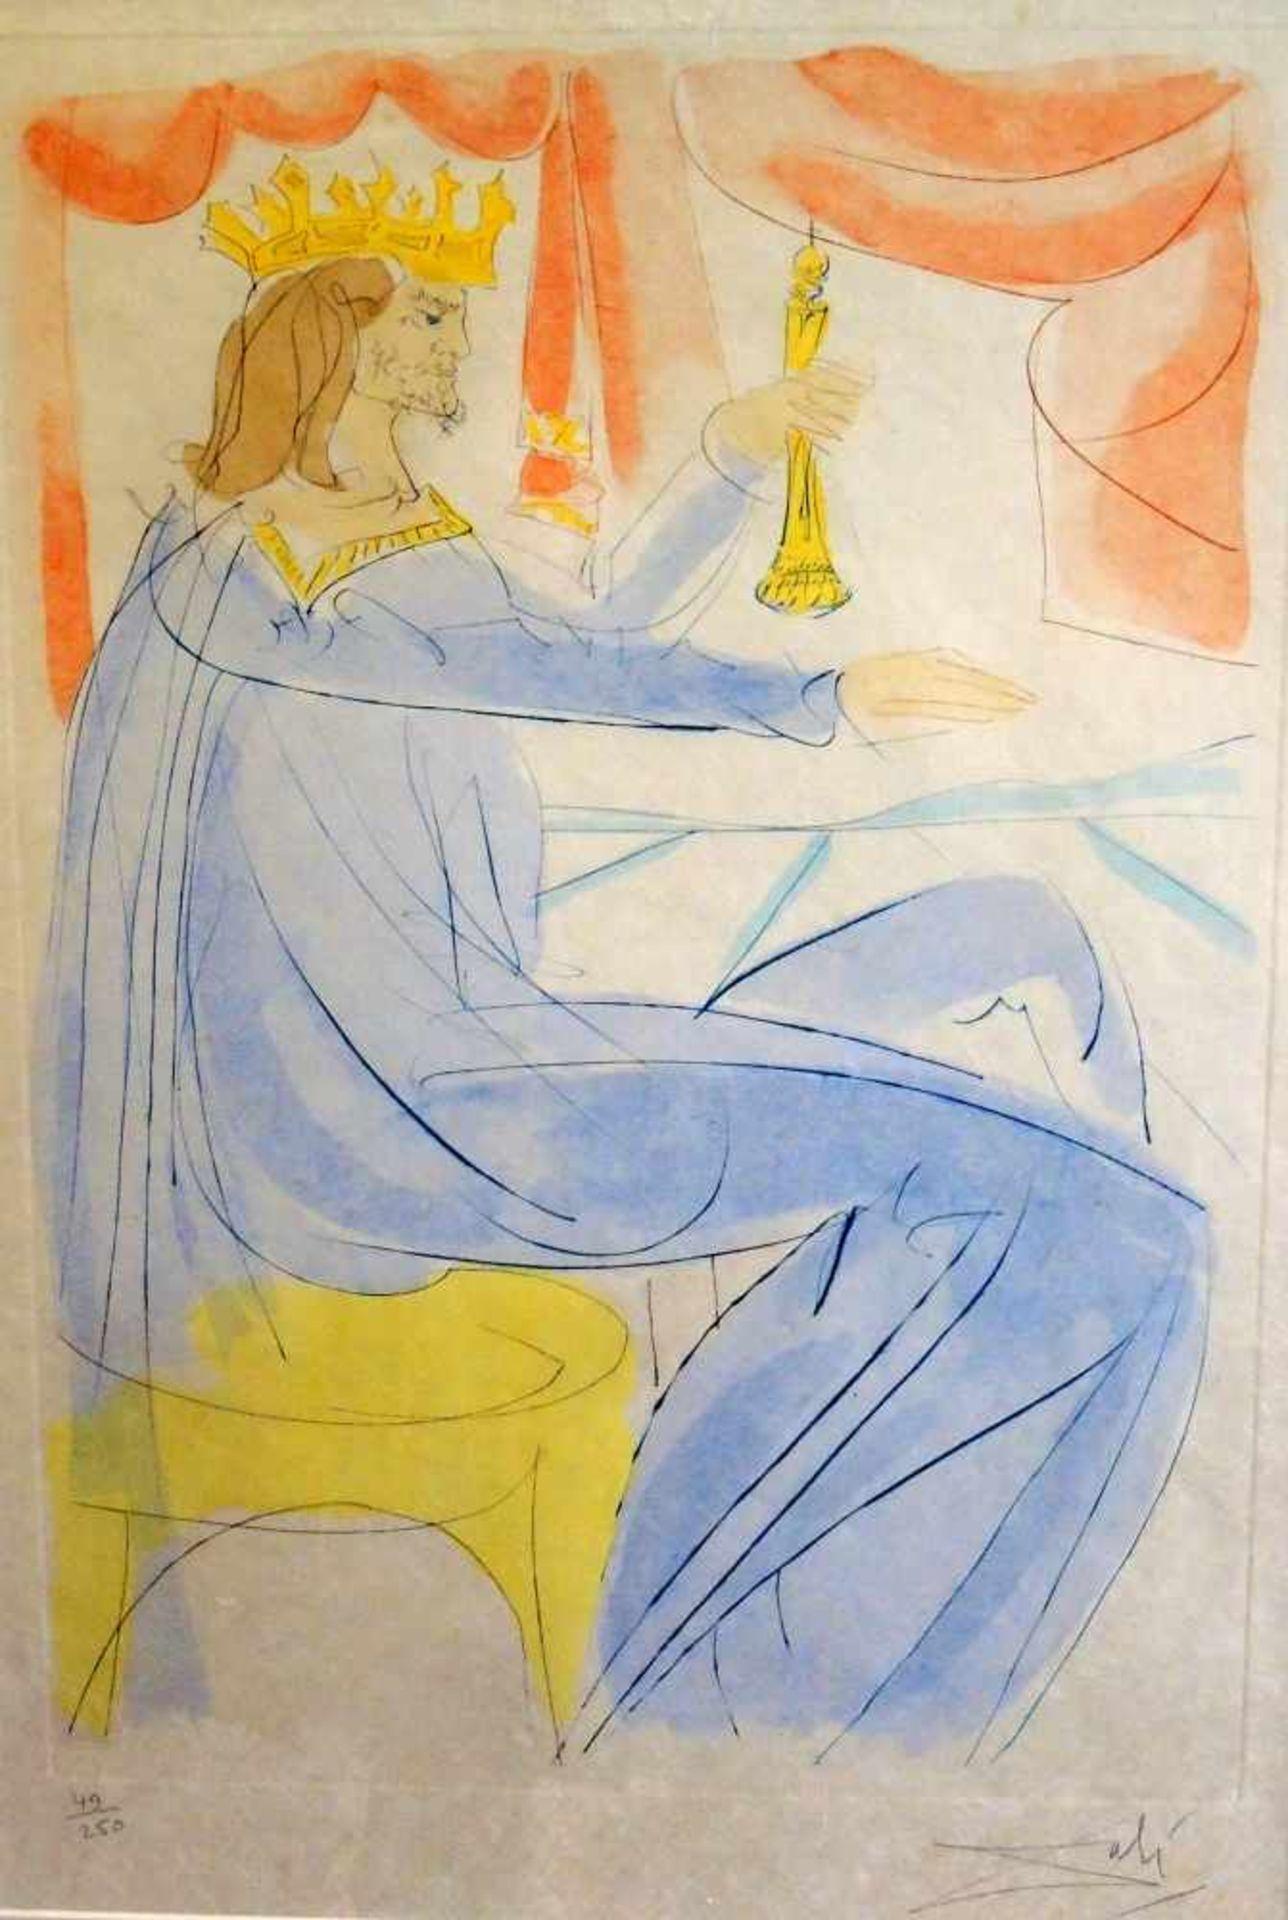 Salvador Dalí, 1904 Figueres - 1989 ebendaAls Hauptvertreter des in den 1920er- Jahren